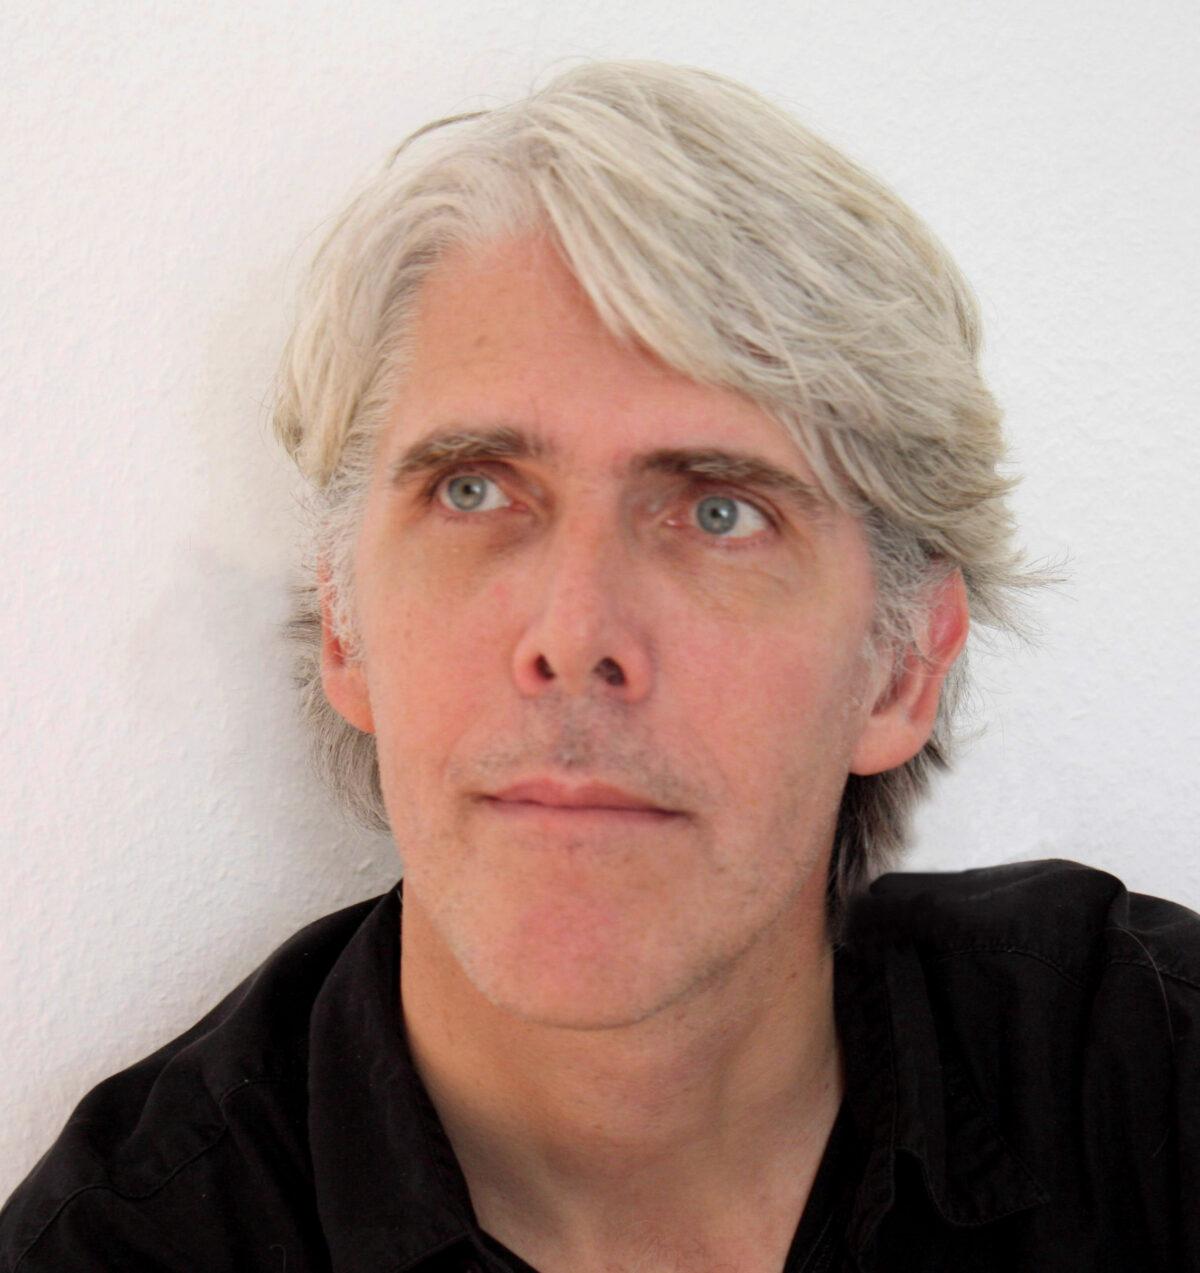 Gastblog van Thomas van Slobbe: duurzaamheid binnen handbereik